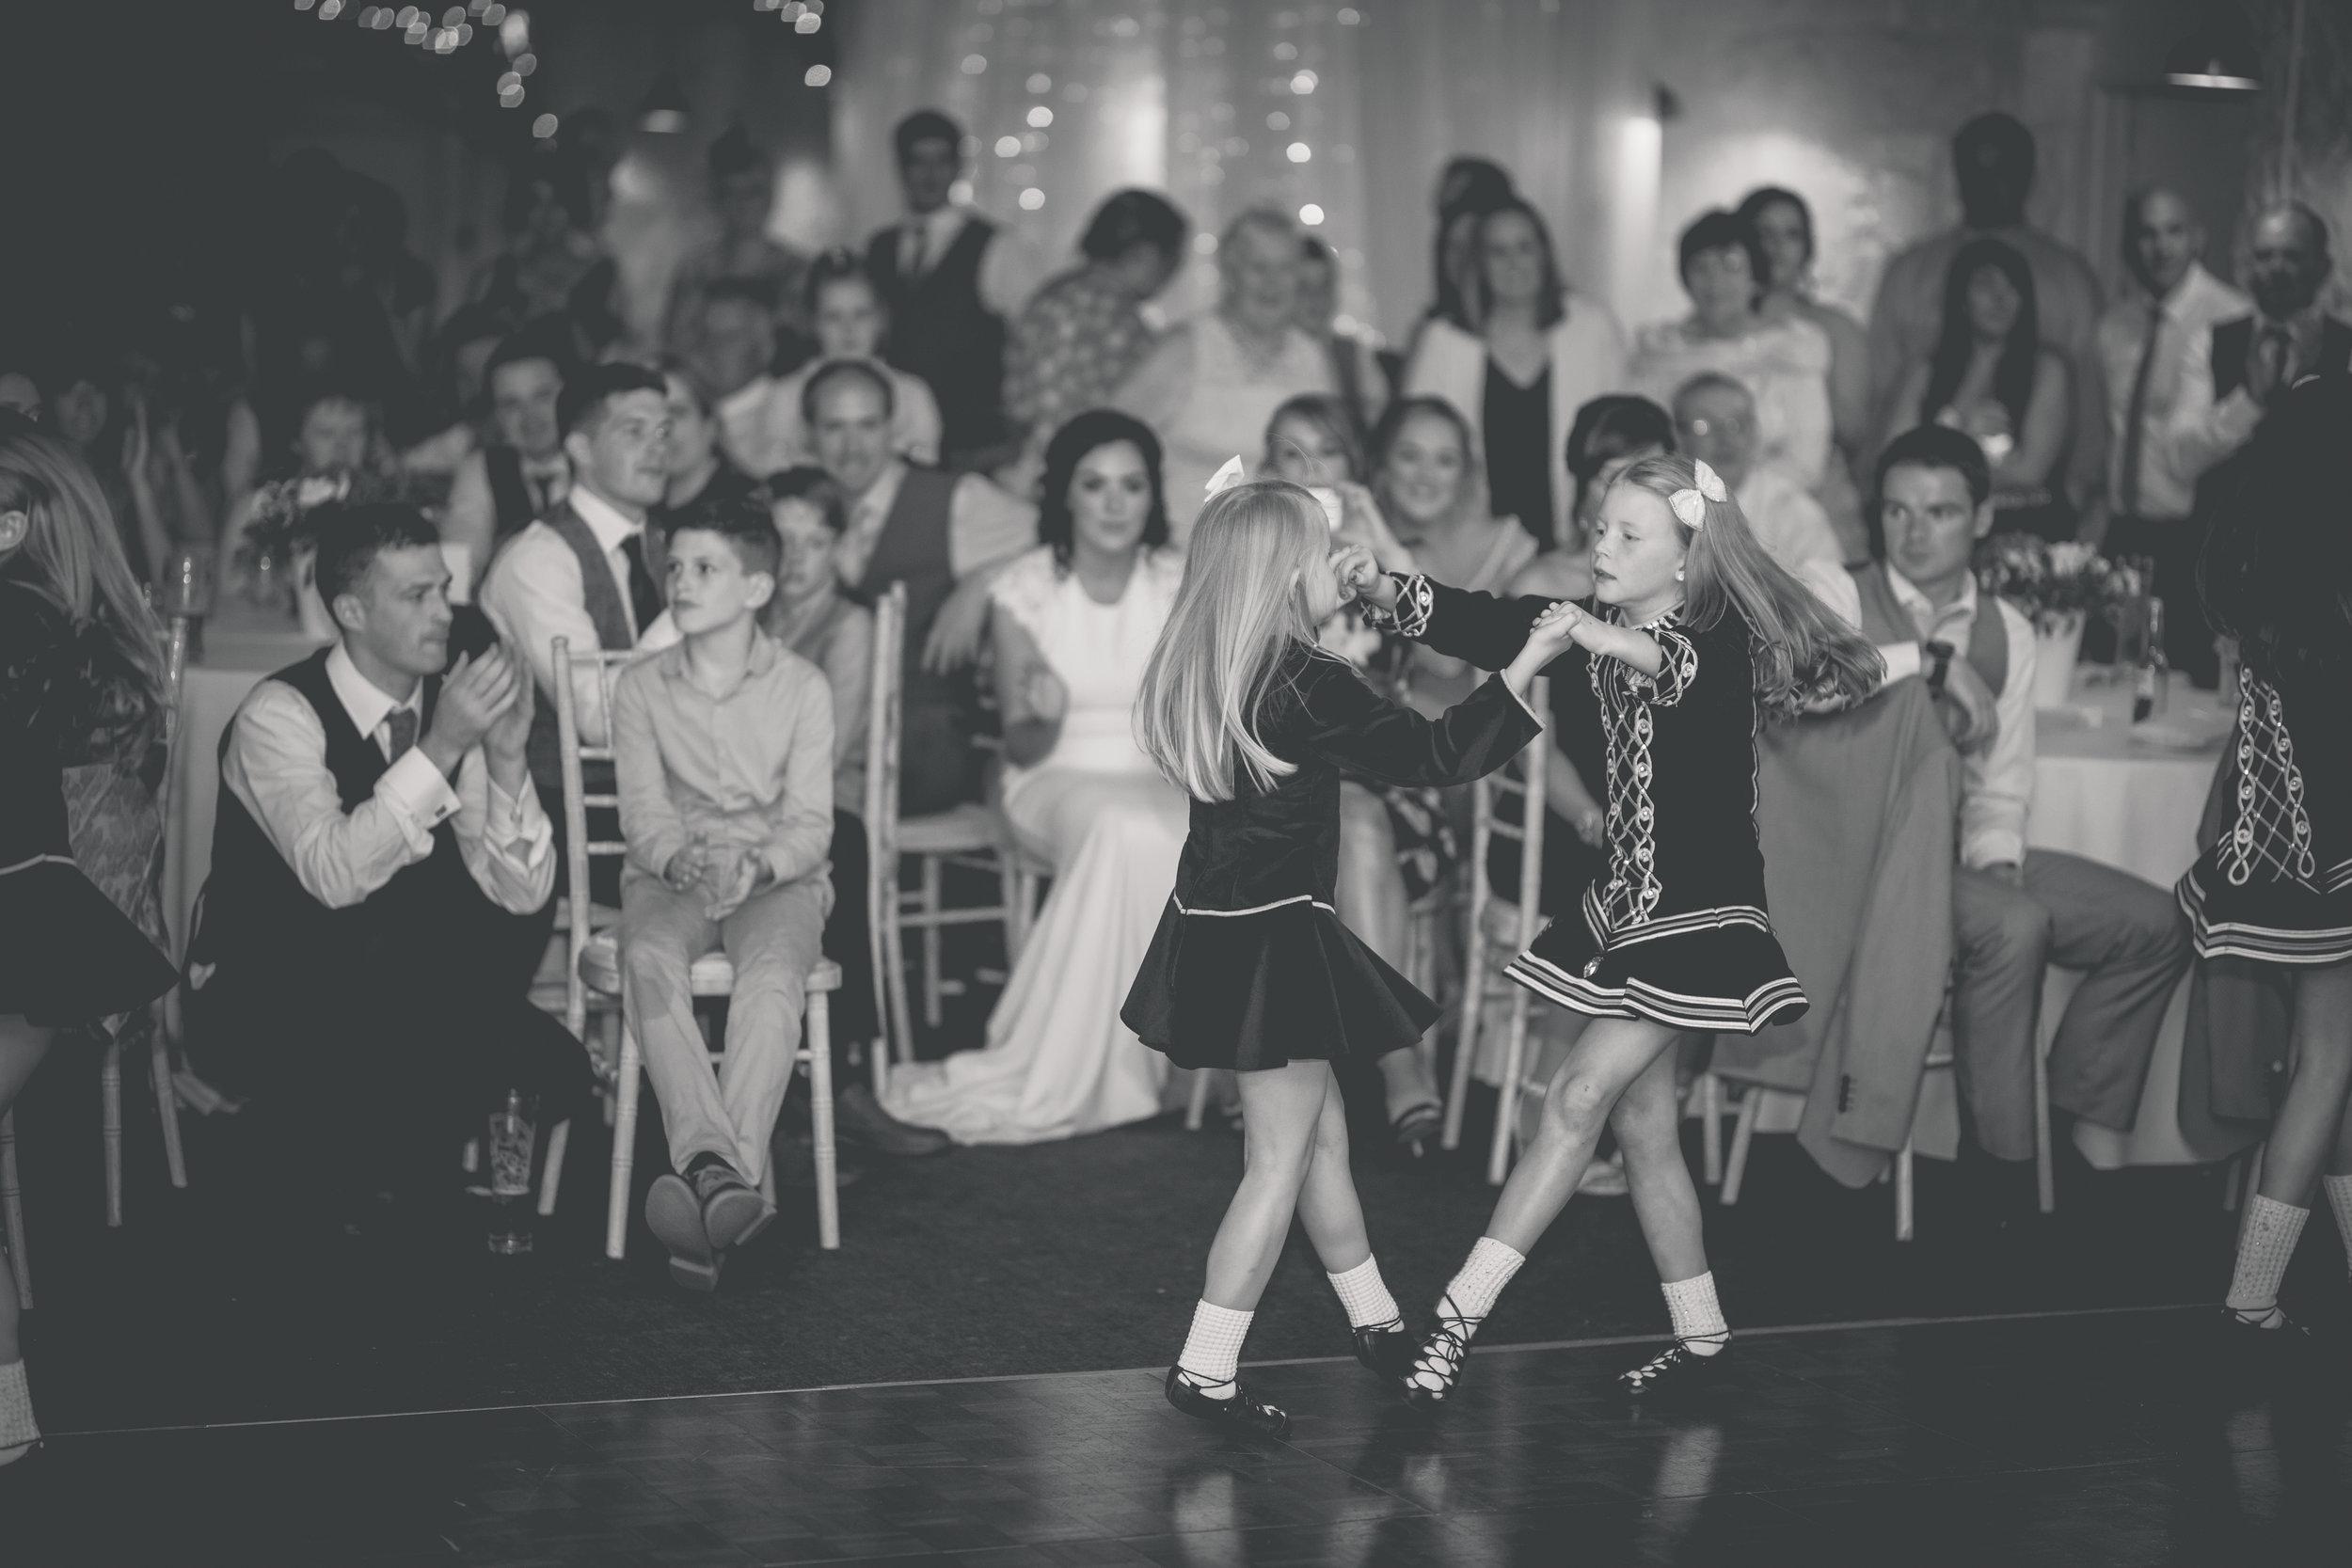 Brian McEwan Wedding Photography | Carol-Annee & Sean | The Dancing-12.jpg